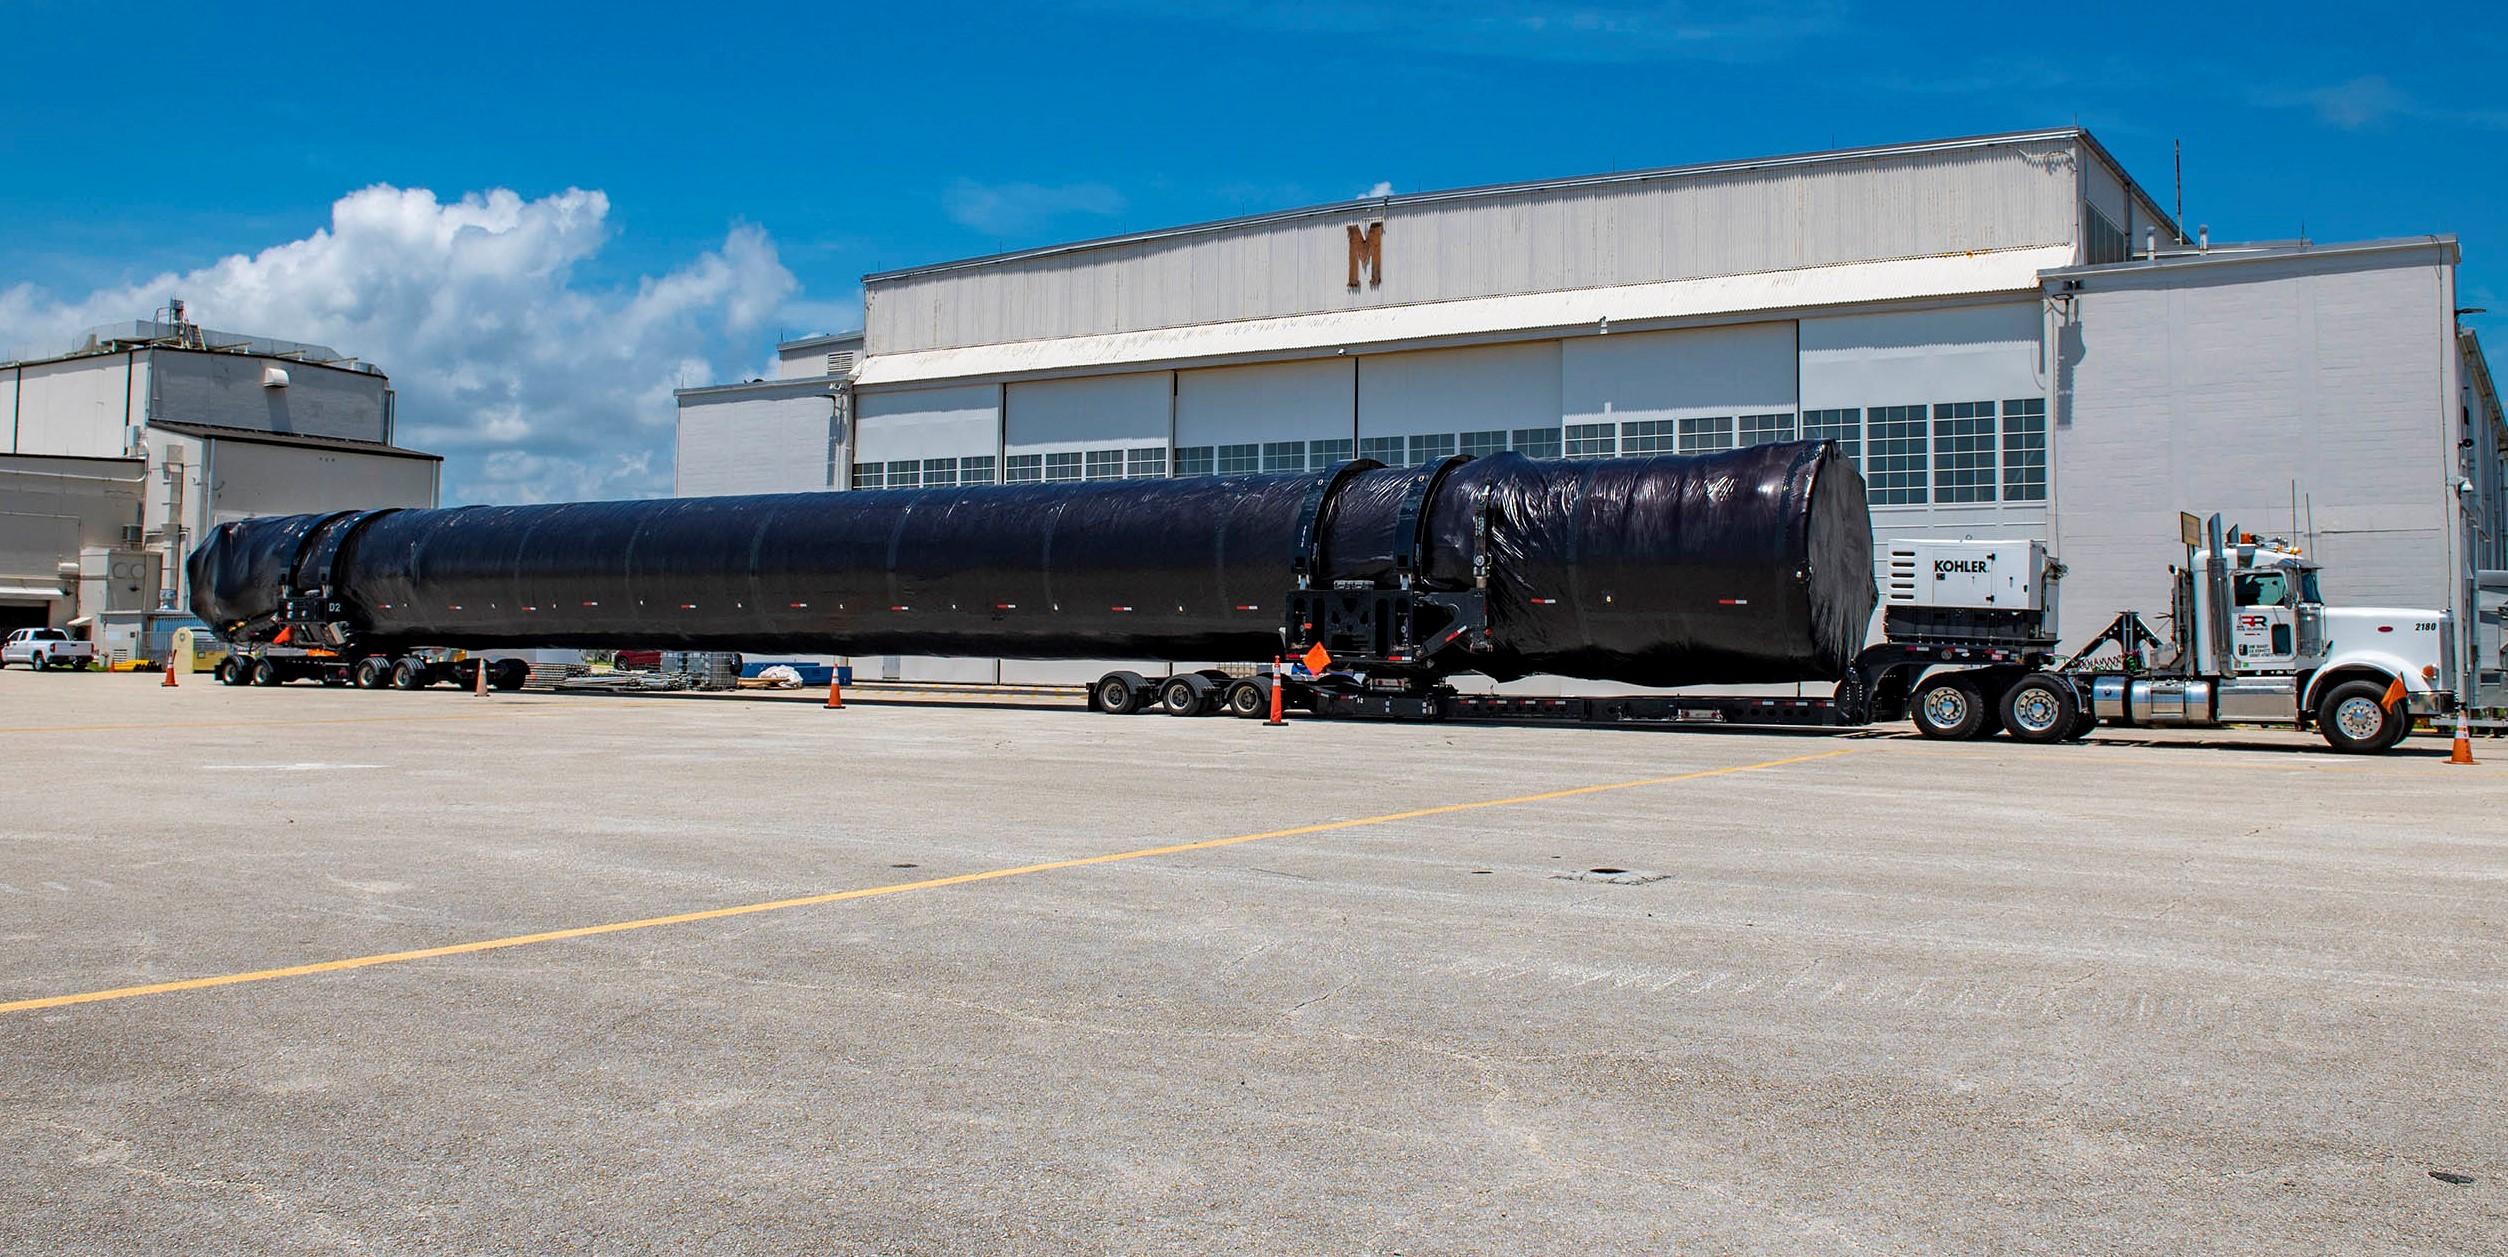 Crew-1 Falcon 9 B1061 FL arrival 071420 (SpaceX) 1 crop